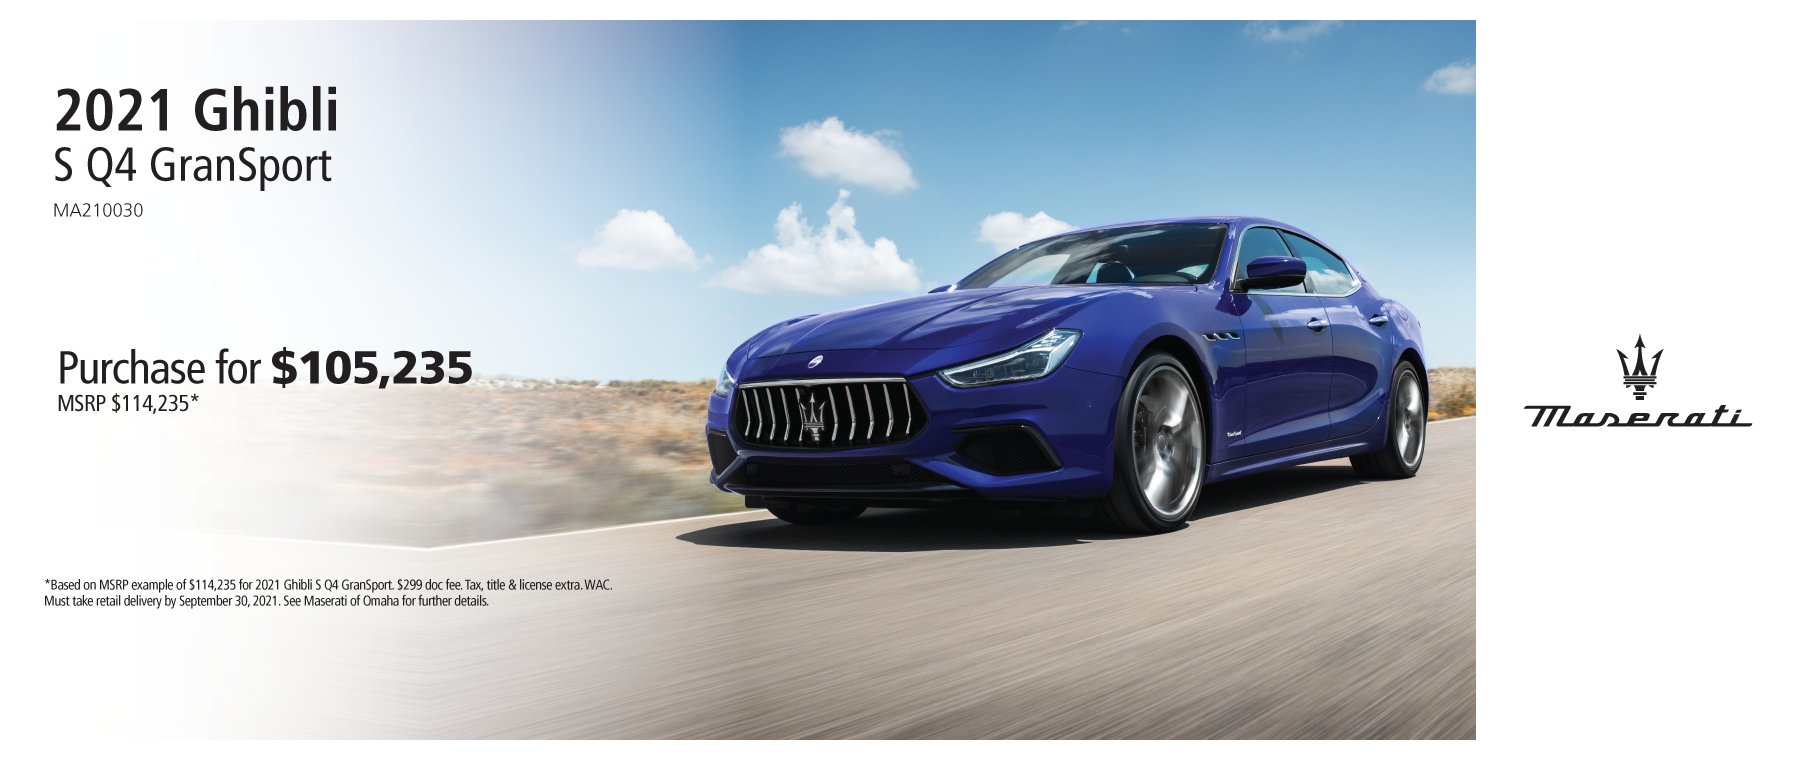 0921-Maserati-GHIBLI-DESKTOP